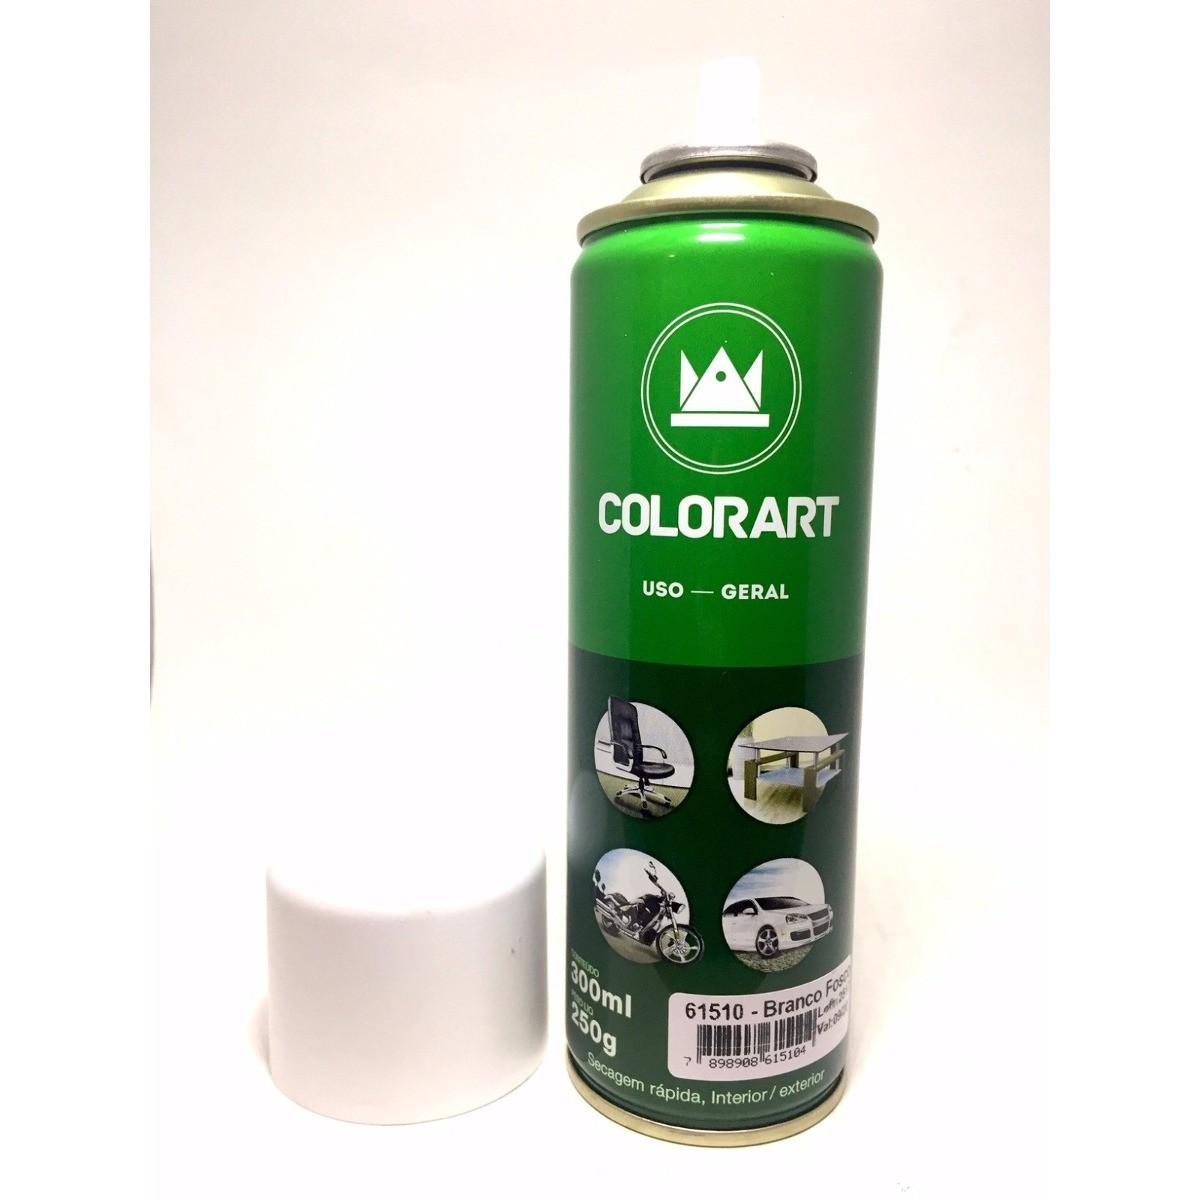 Tinta Spray Colorart Uso Geral Branco Fosco  - Rea Comércio - Sua Loja Completa!